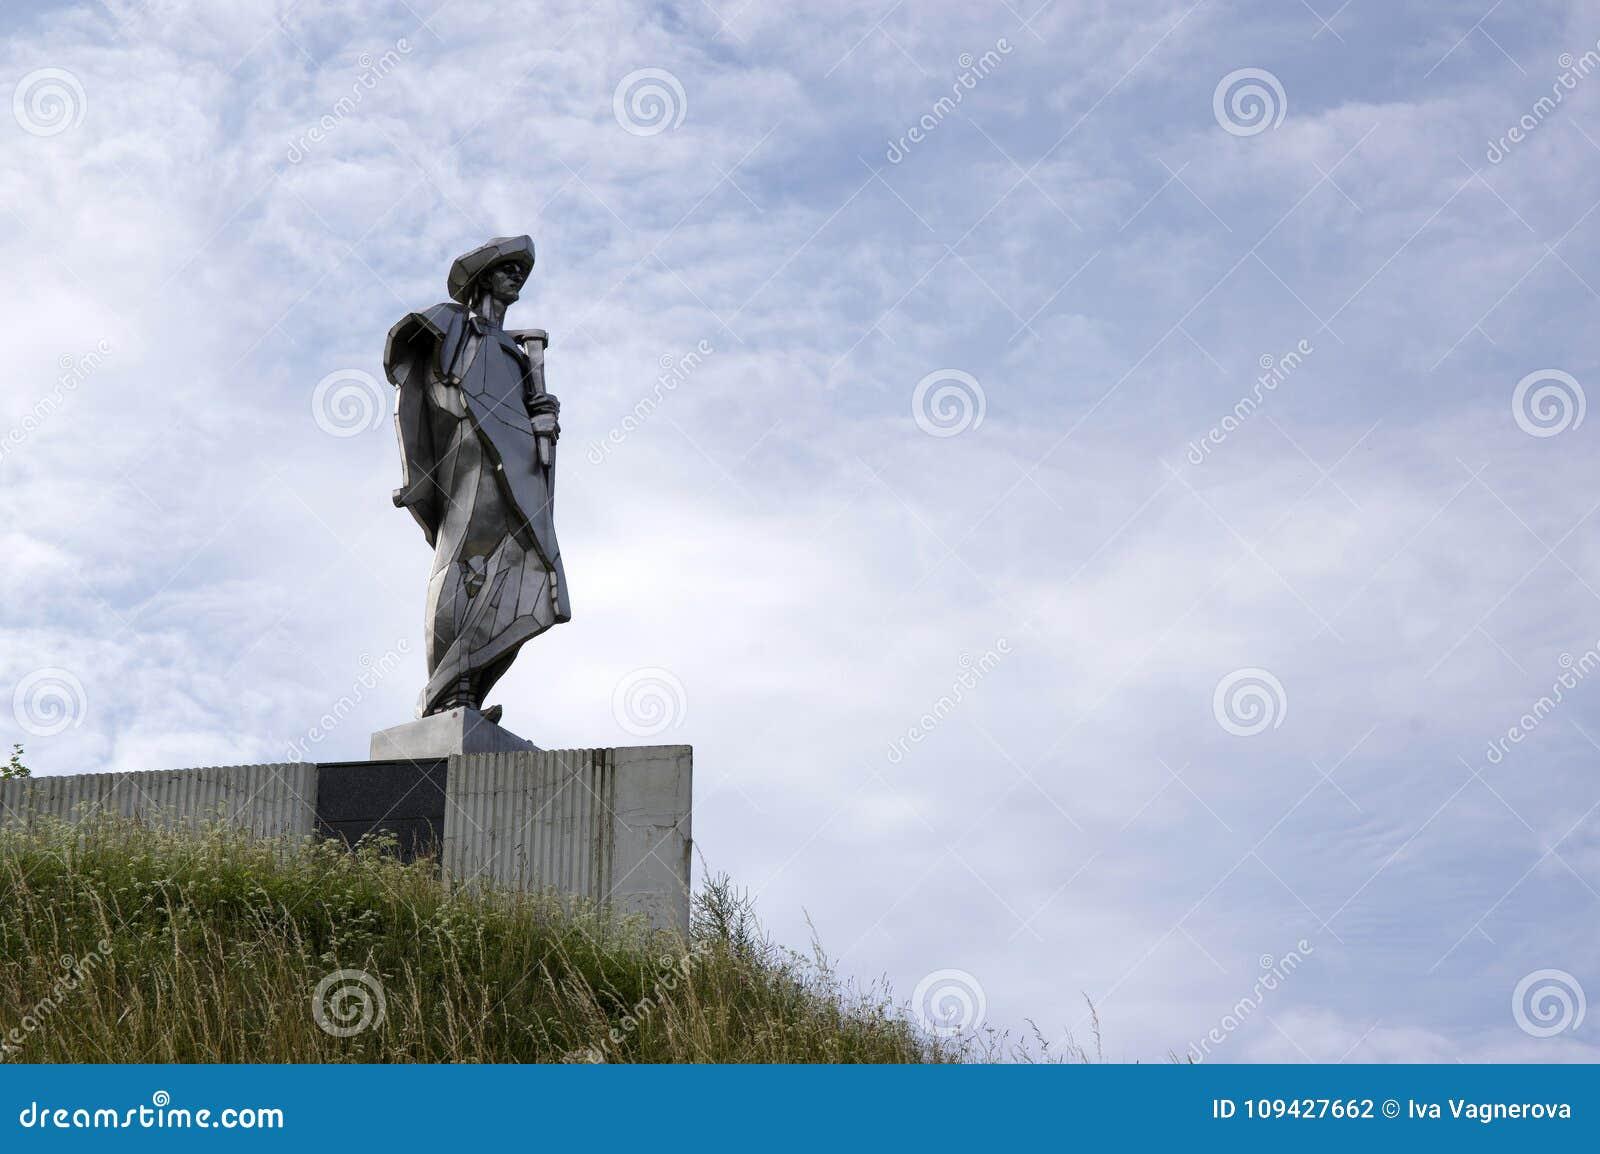 July 10, 2016, place of interest, Juraj Janosik statue, Terchova, Slovakia